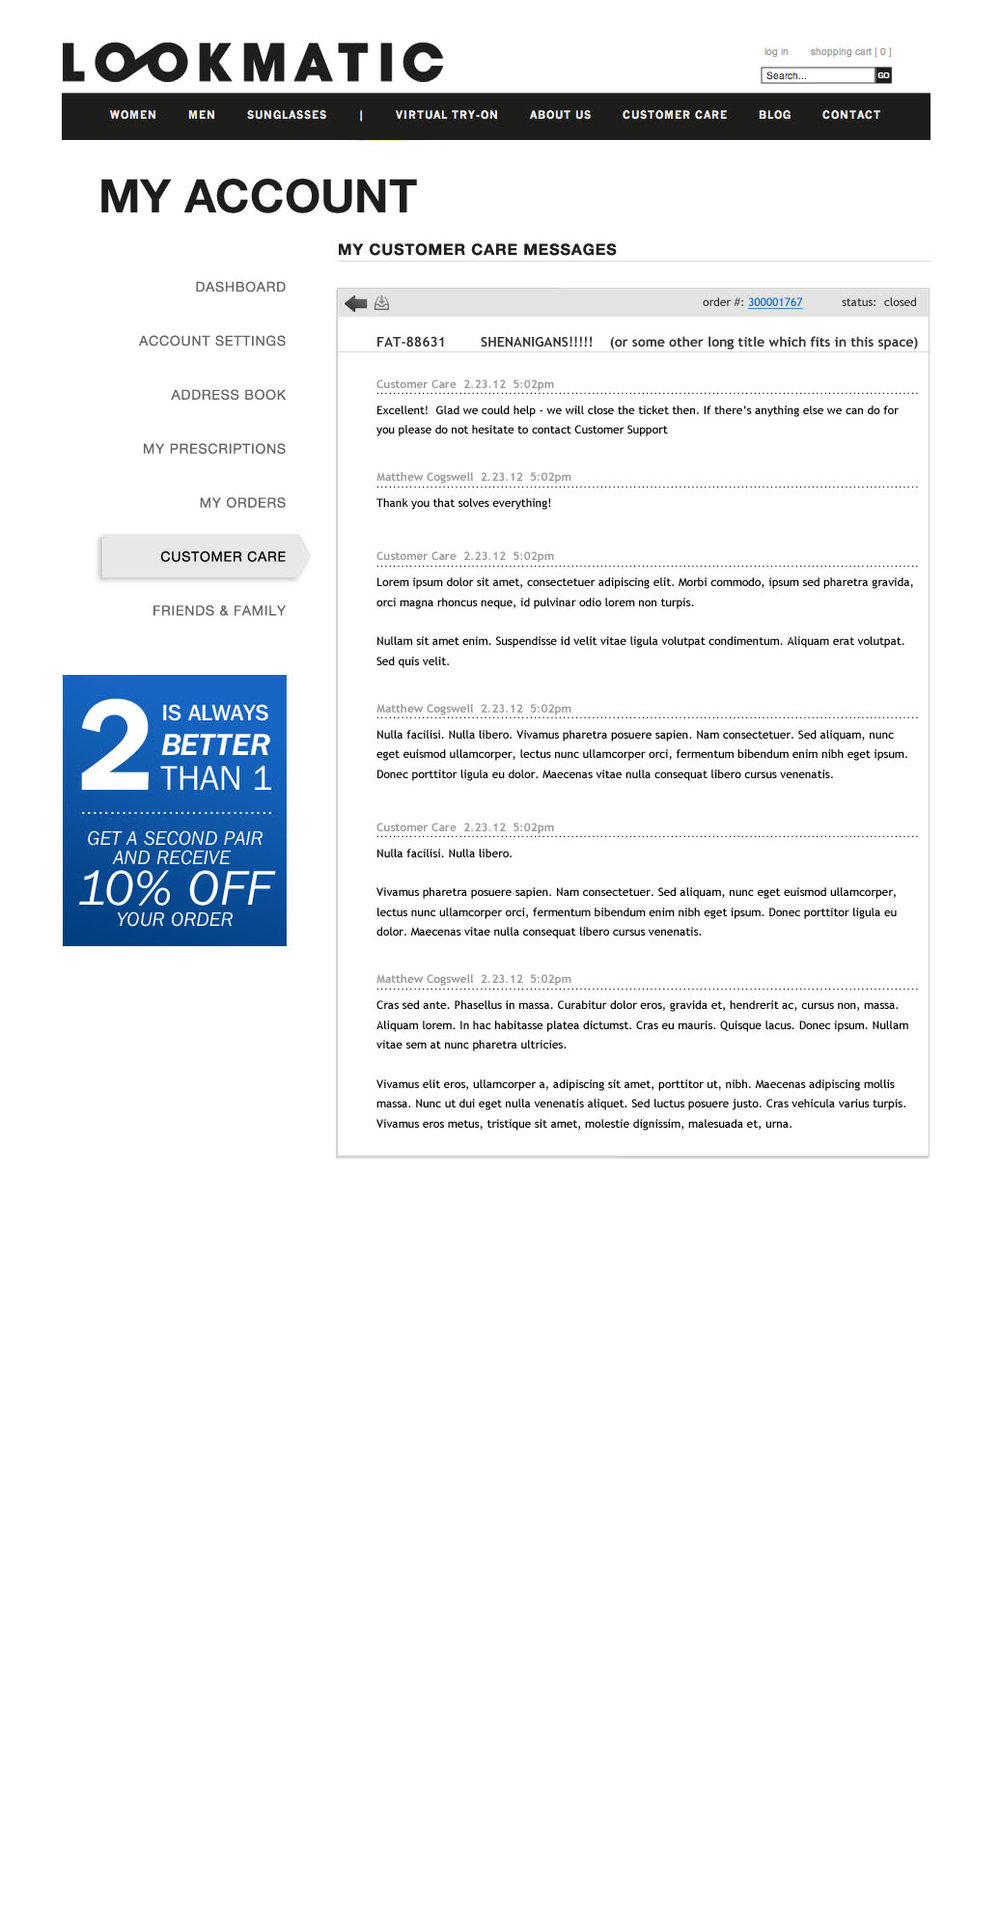 32 - Customer Care (msg)